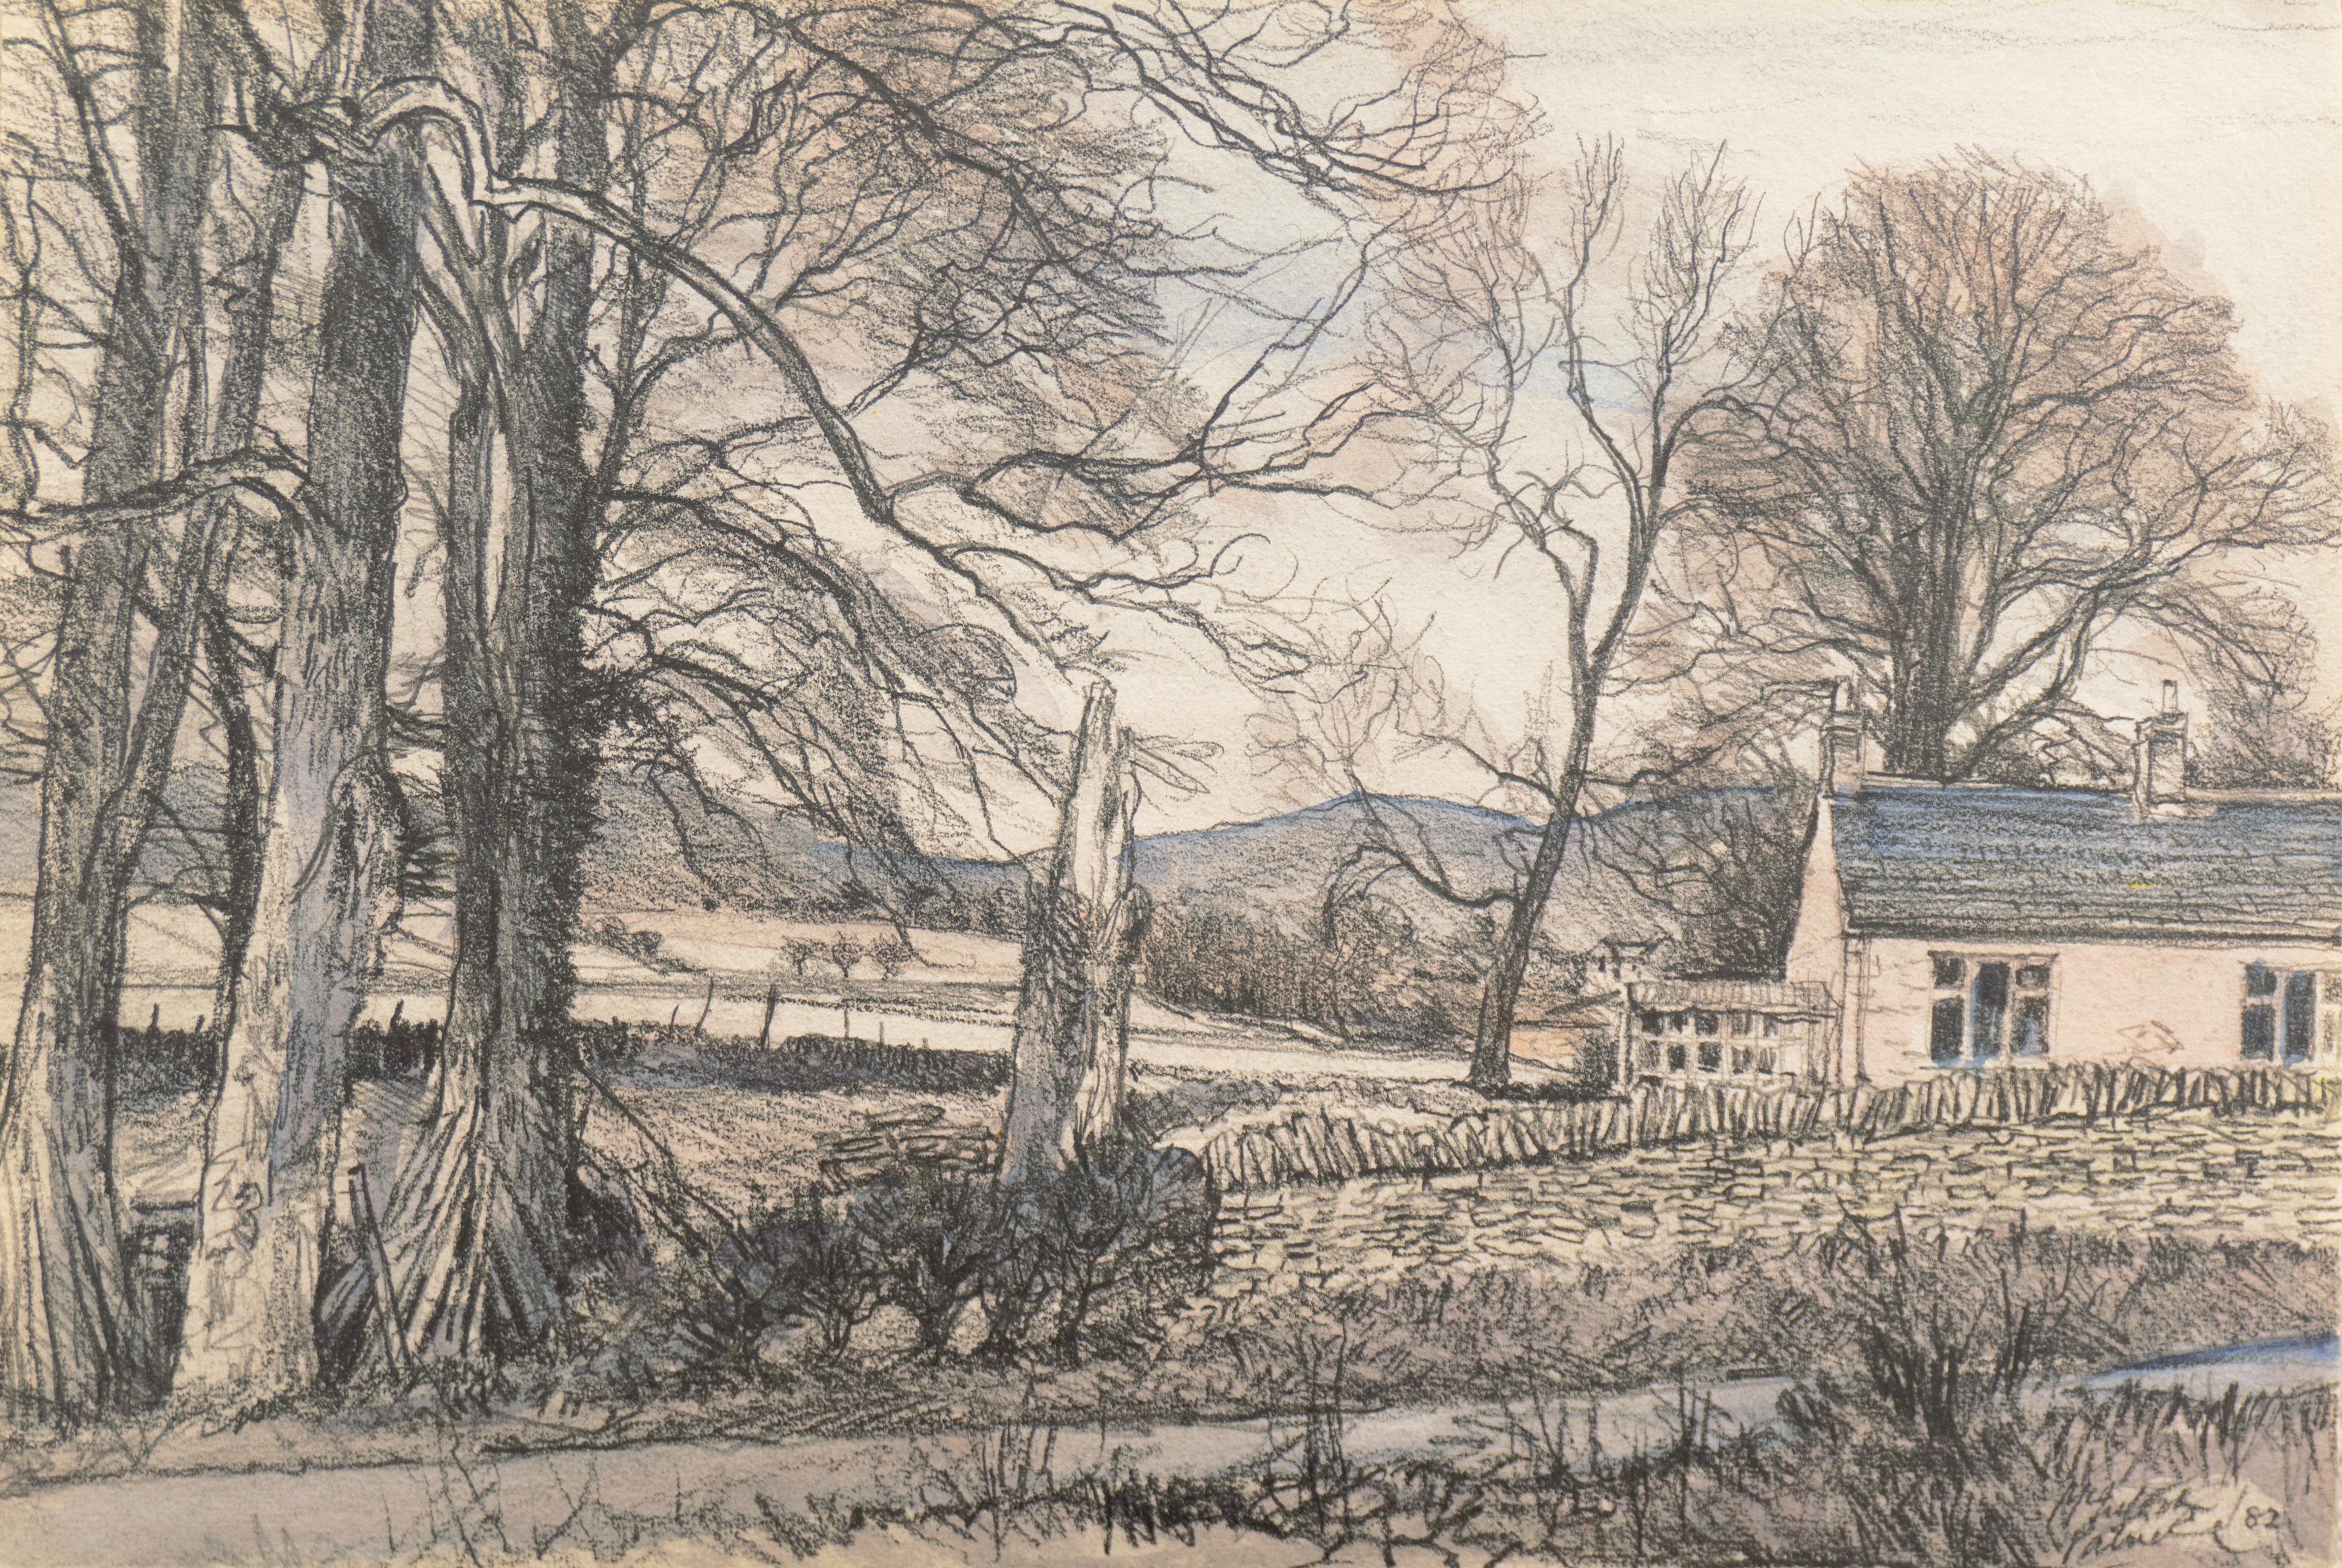 'Windy Day Fallows, Angus', Dundee, Scotland, Royal Society of Arts, Paris